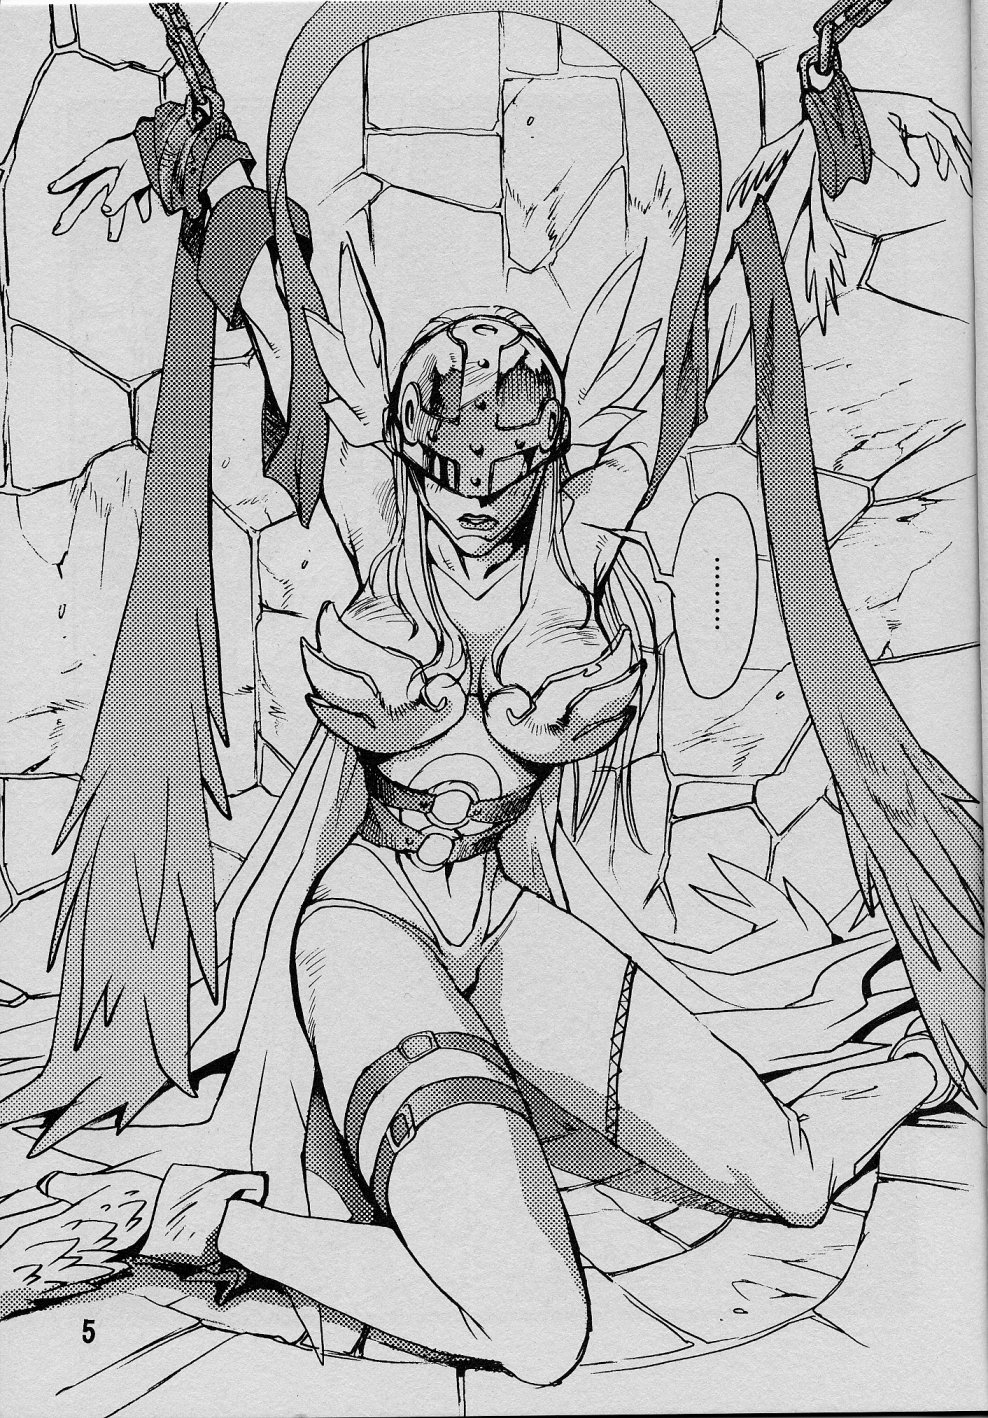 Digimon Hentai Pornô: O anjo caído - Foto 4